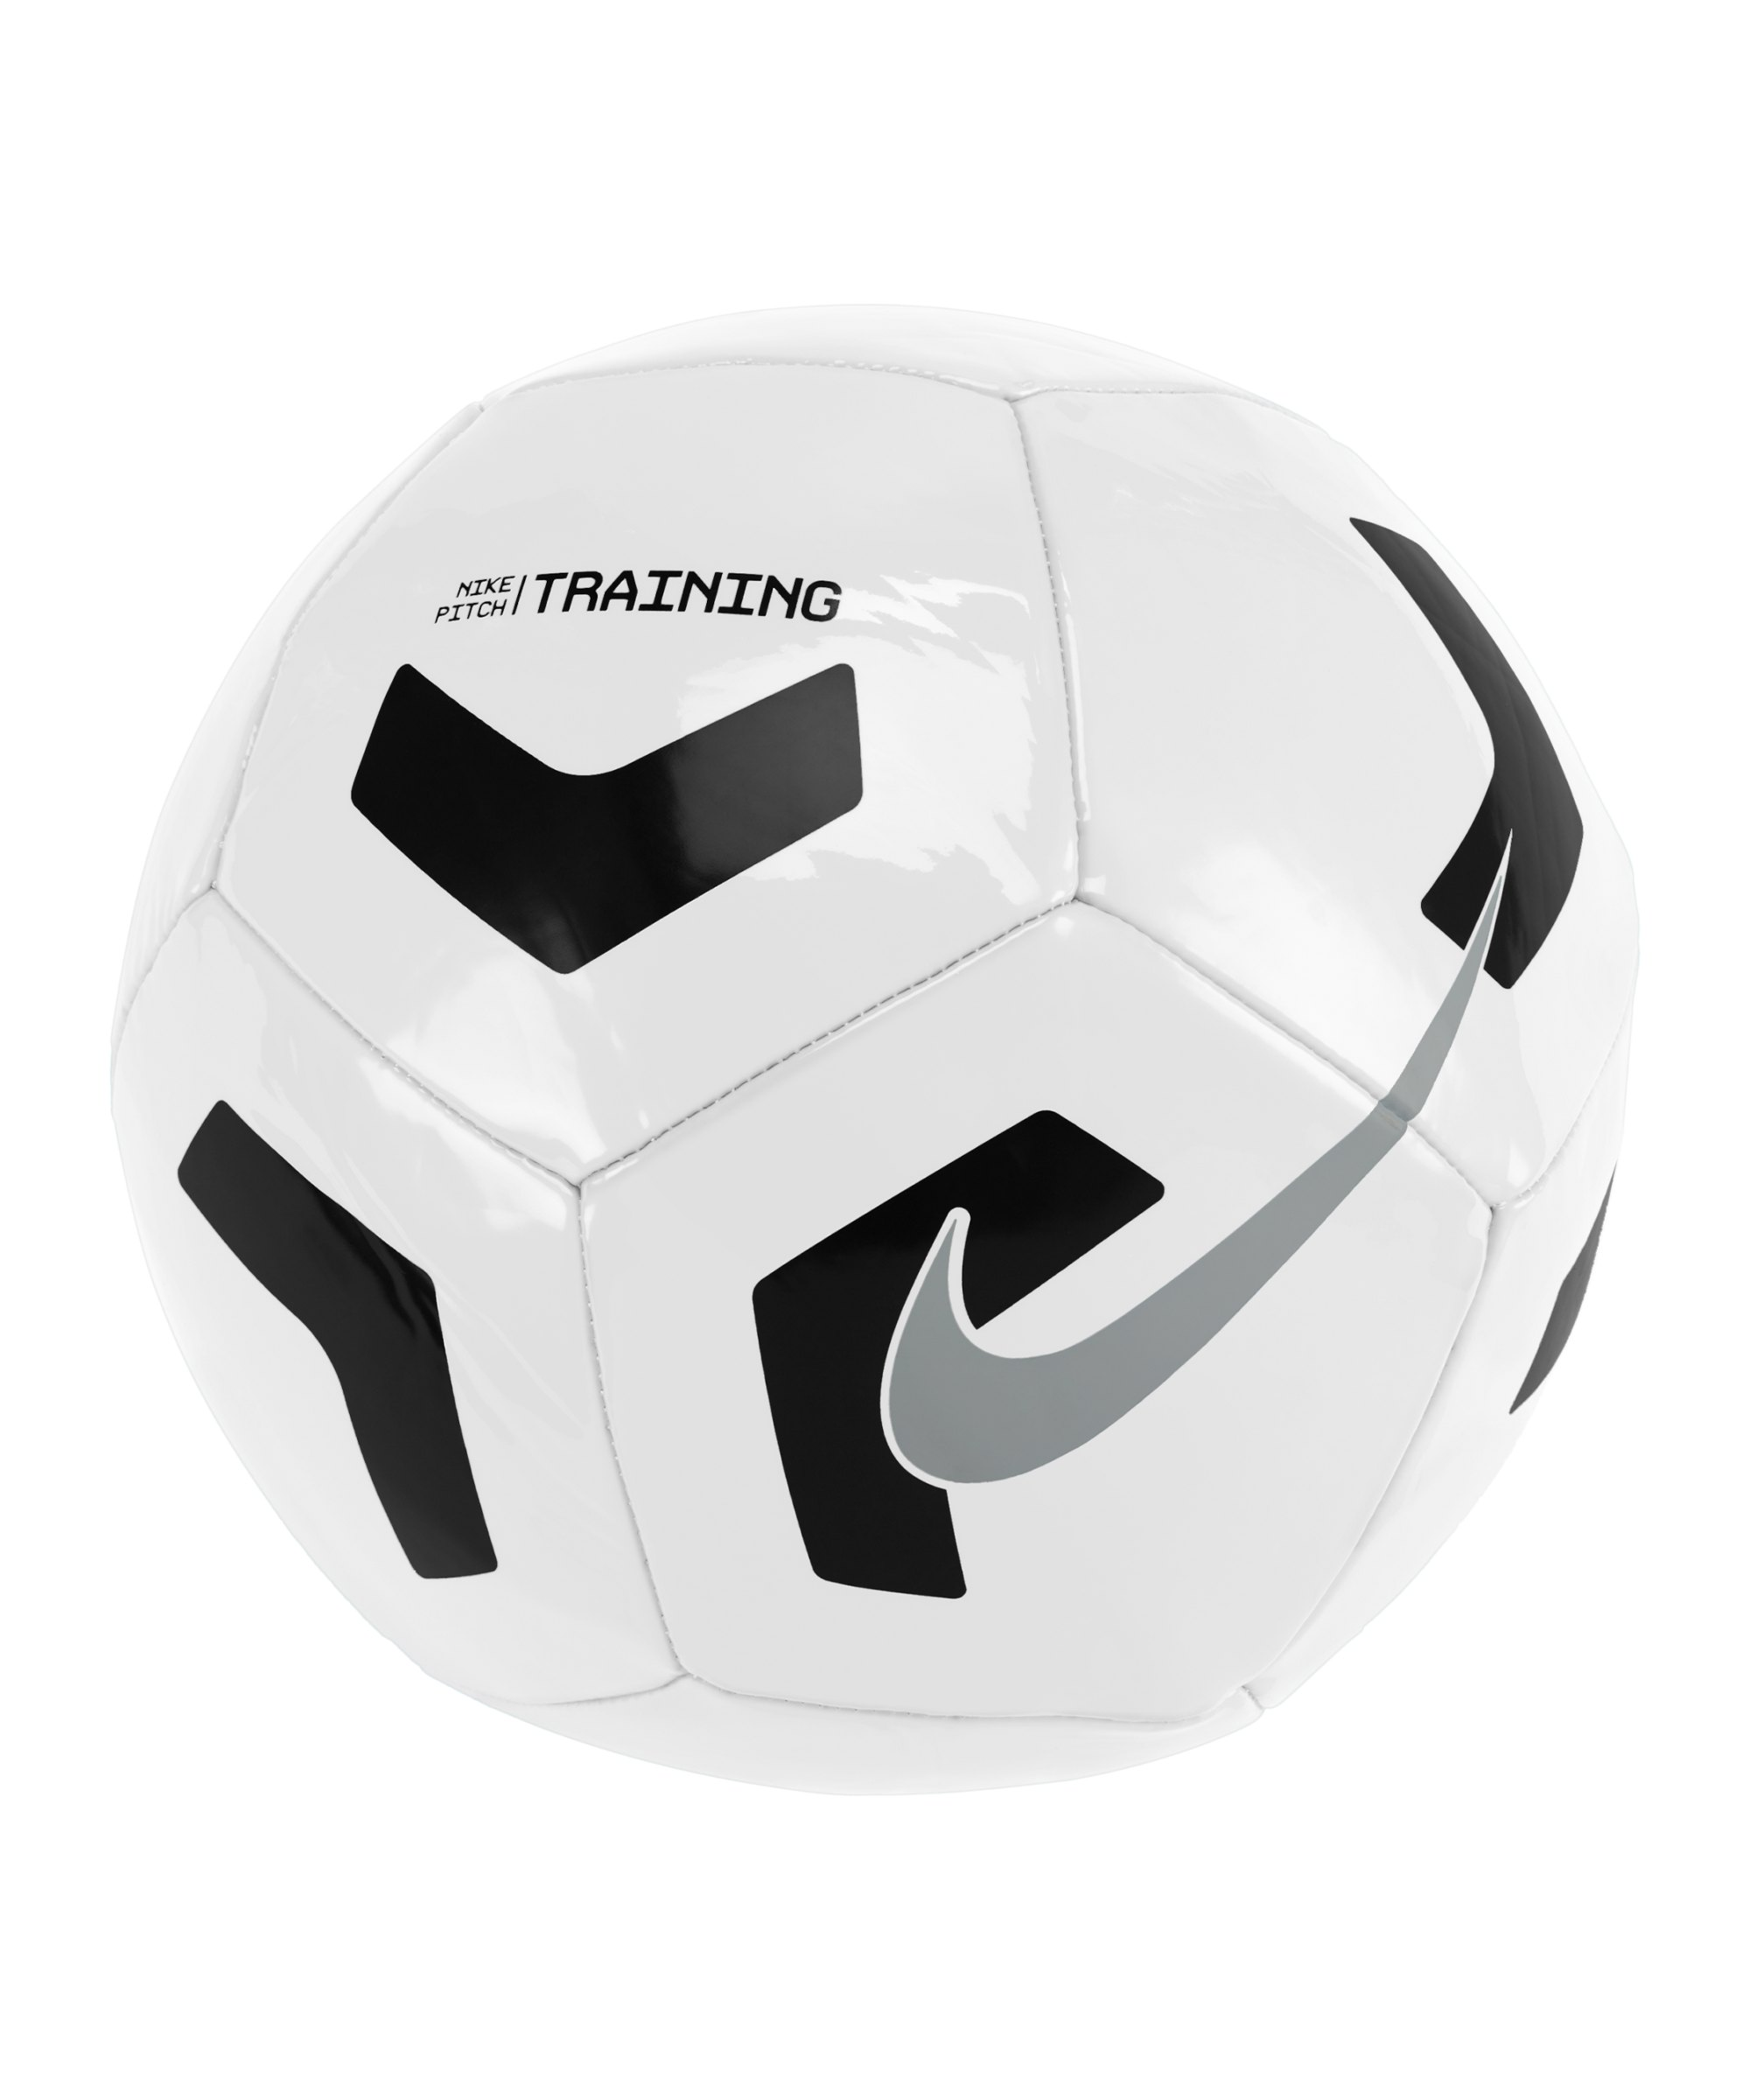 Nike Pitch Trainingsball Weiss Schwarz F100 - weiss